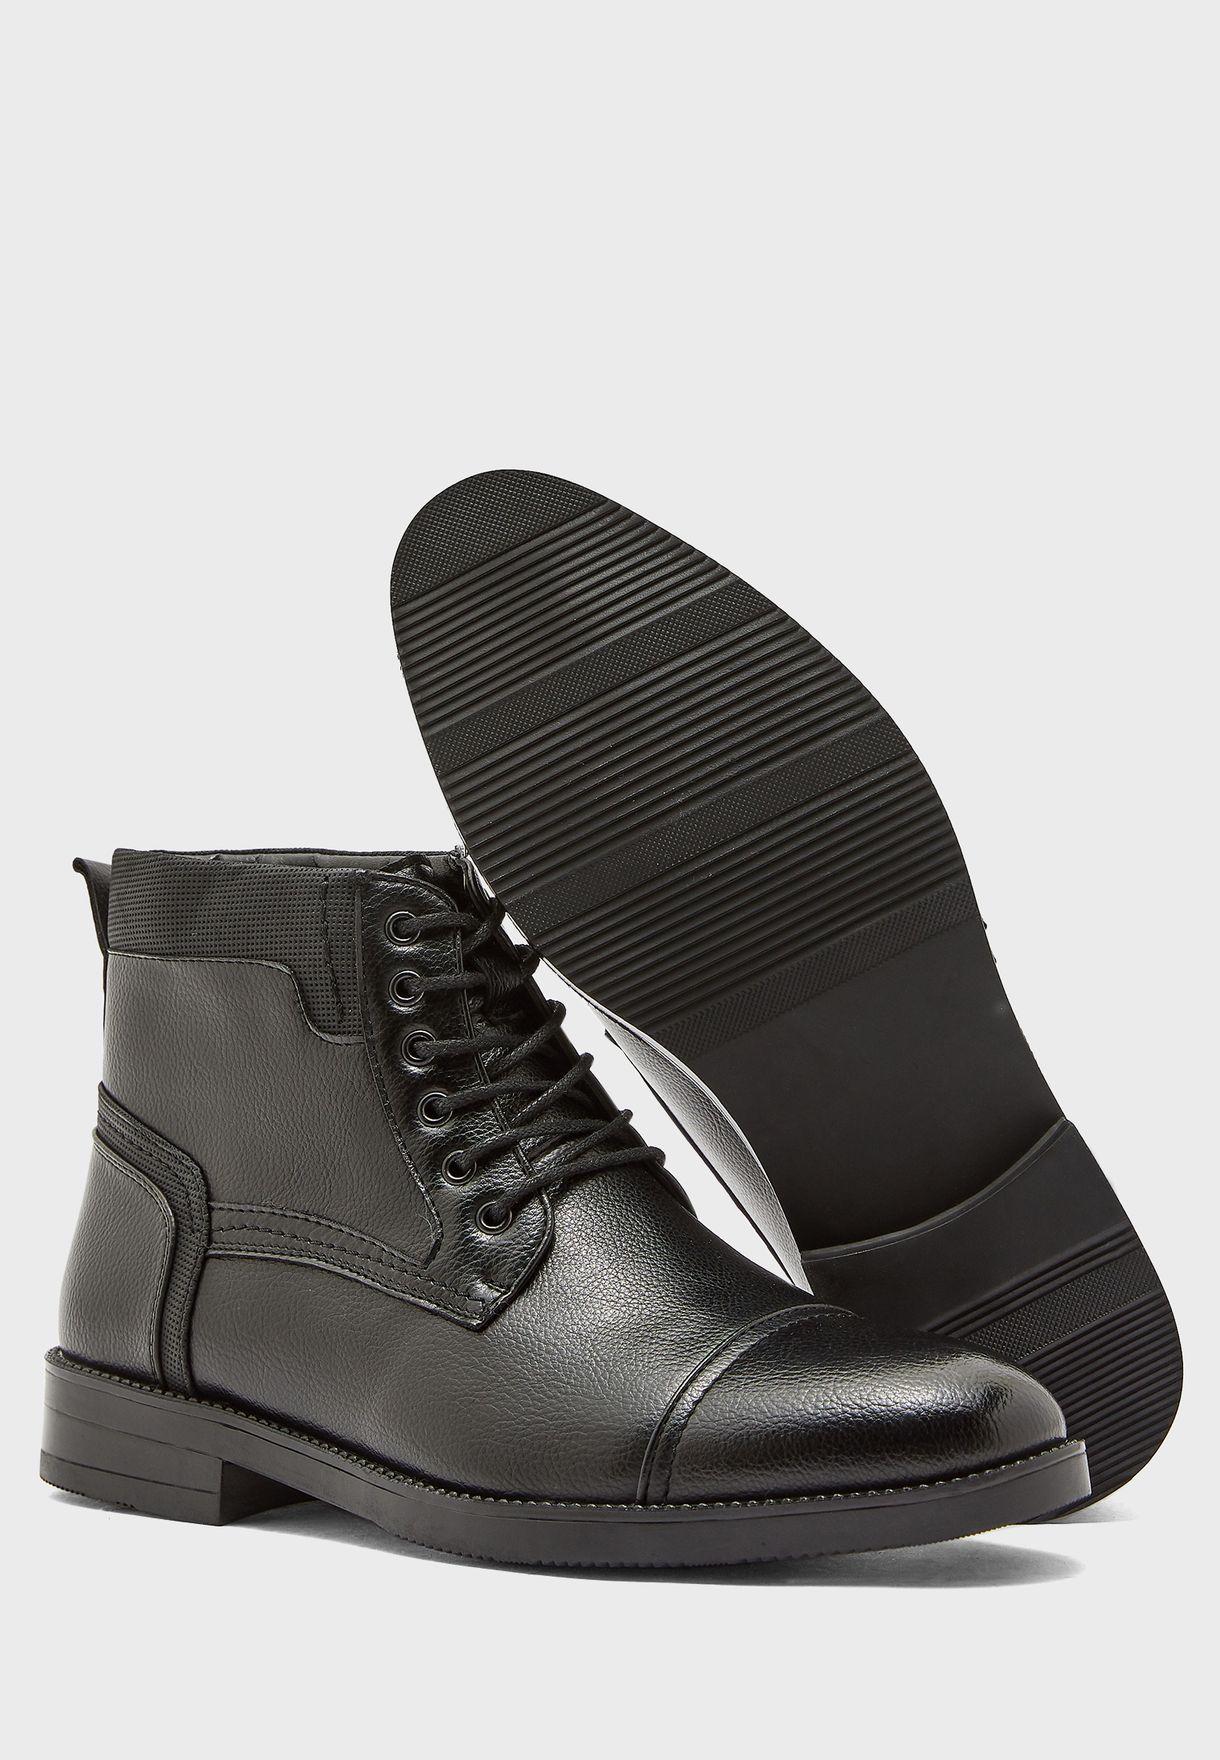 Lace Up Dress Boots